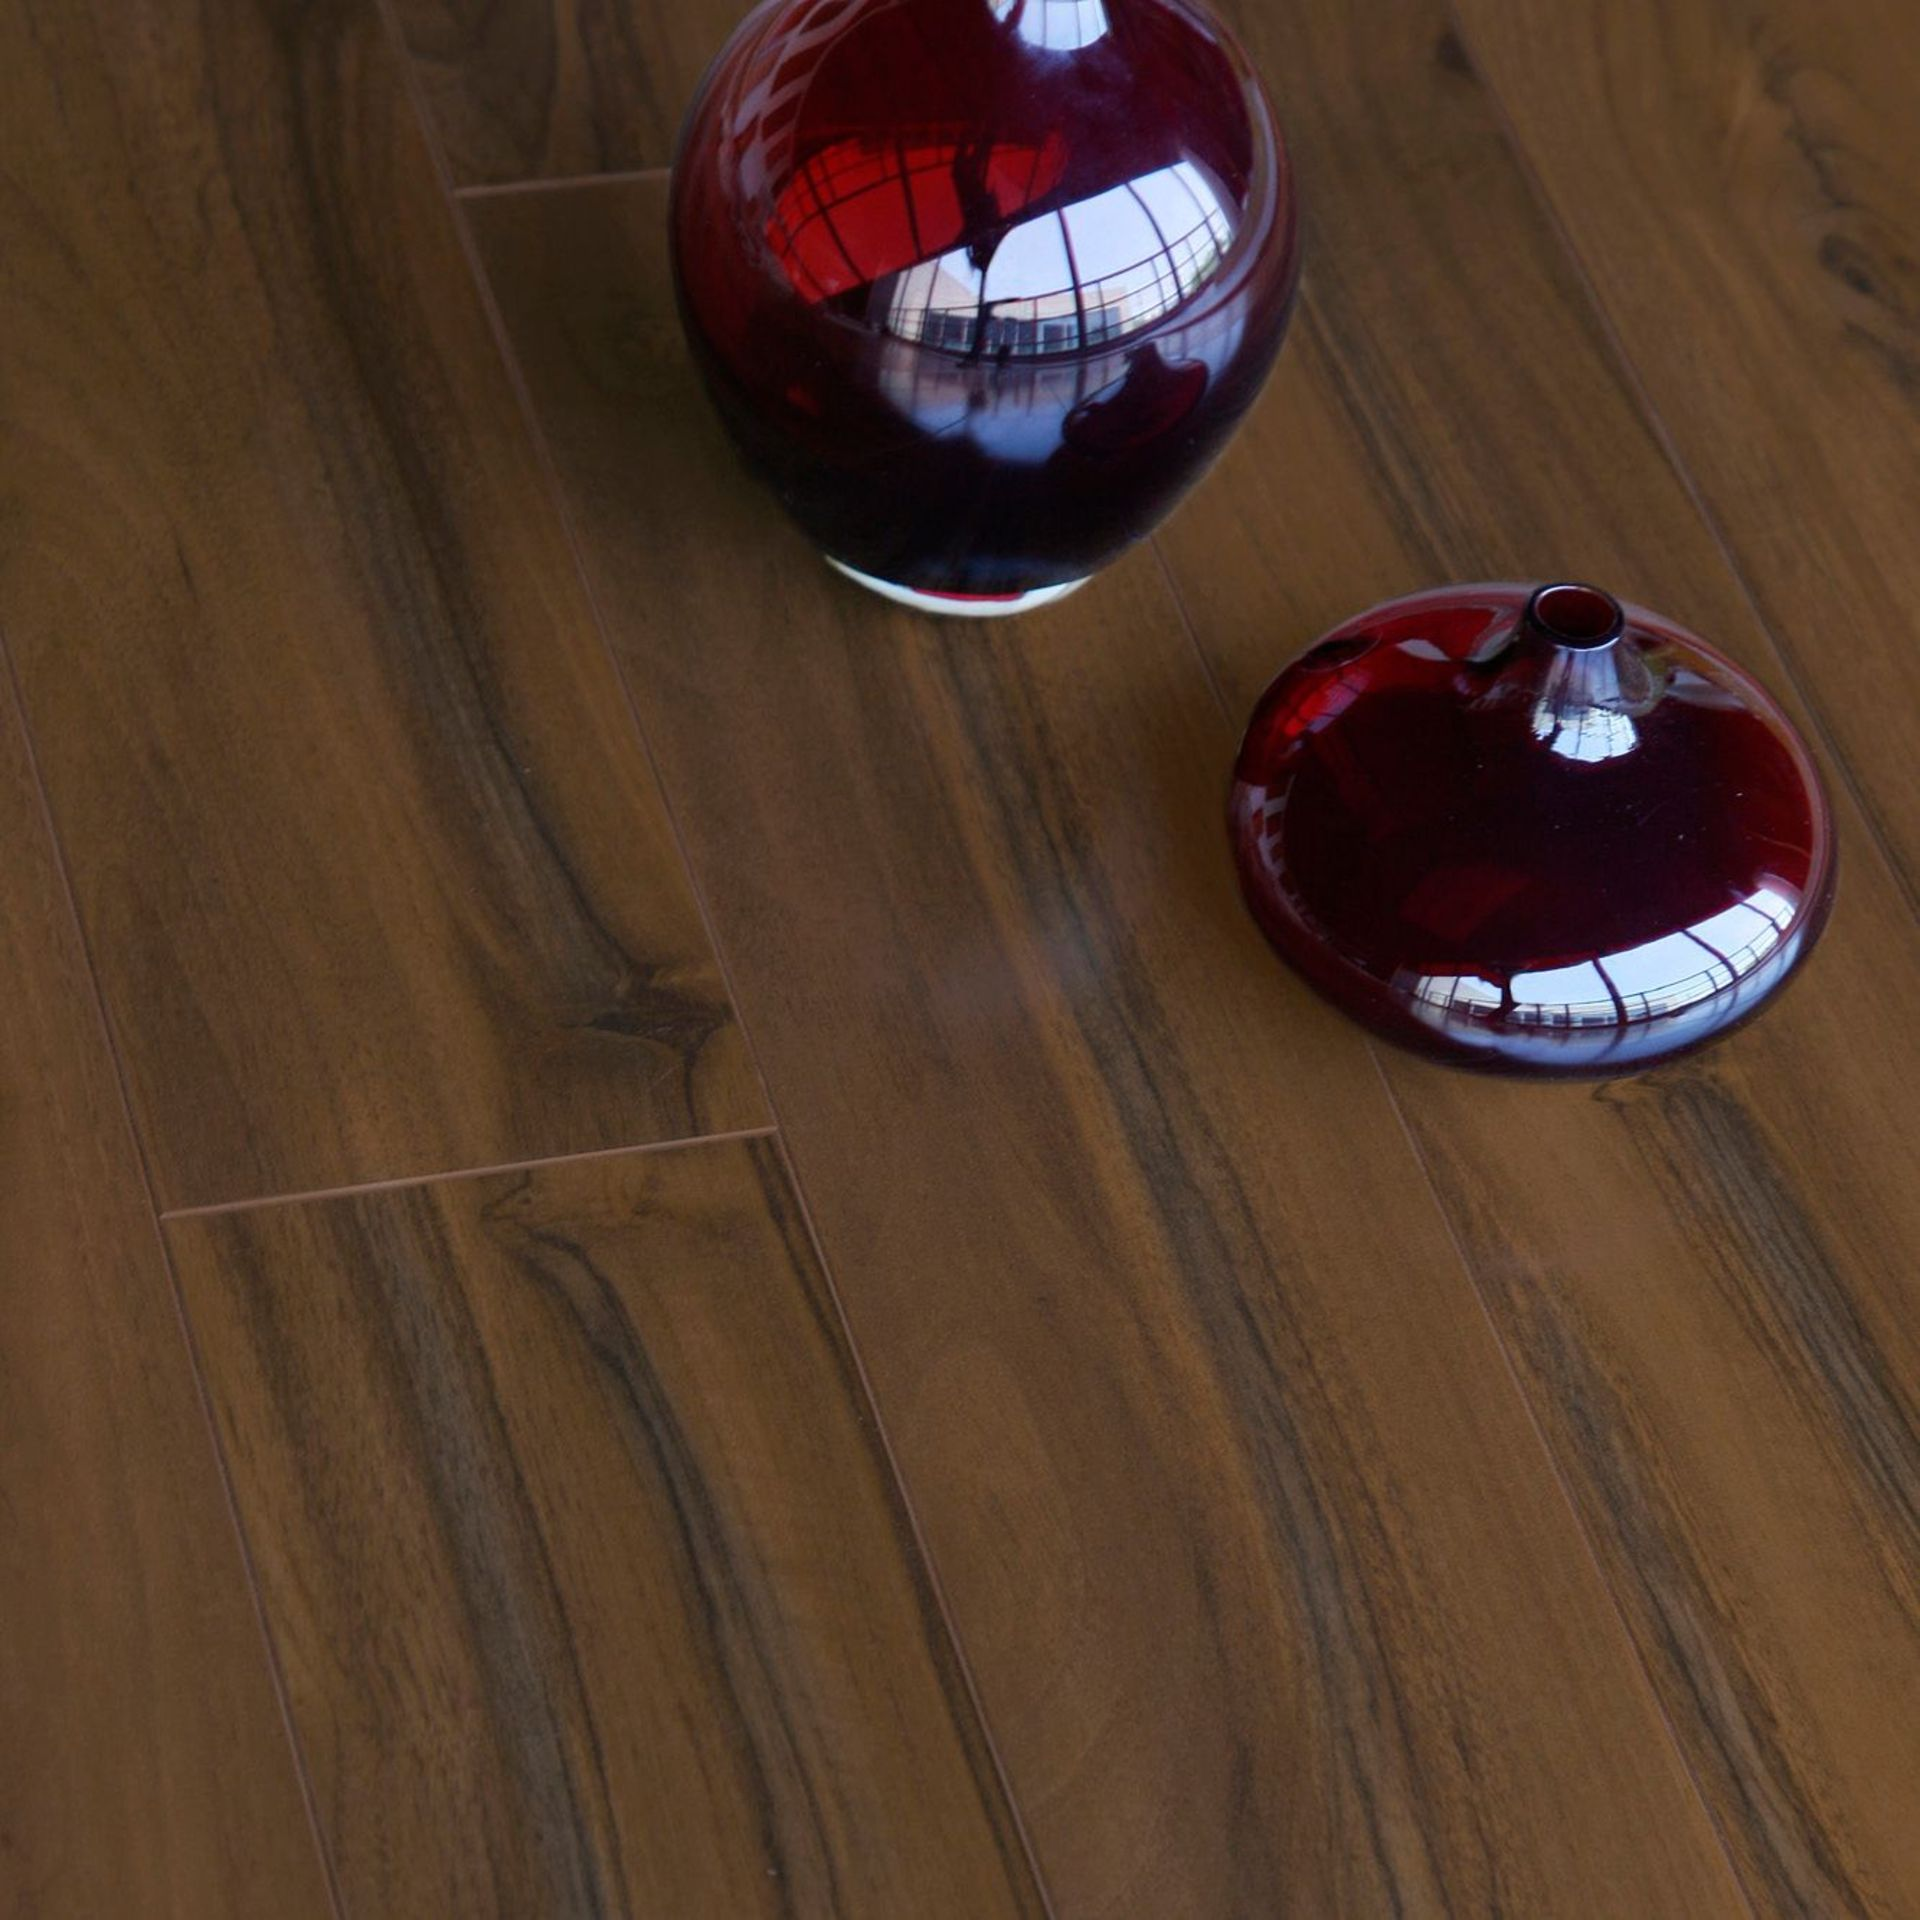 New 24.2M2 Scherzo Dark Walnut Effect Laminate Flooring, 1.21M_ Pack.12mm Thick, 125x1213mm Per